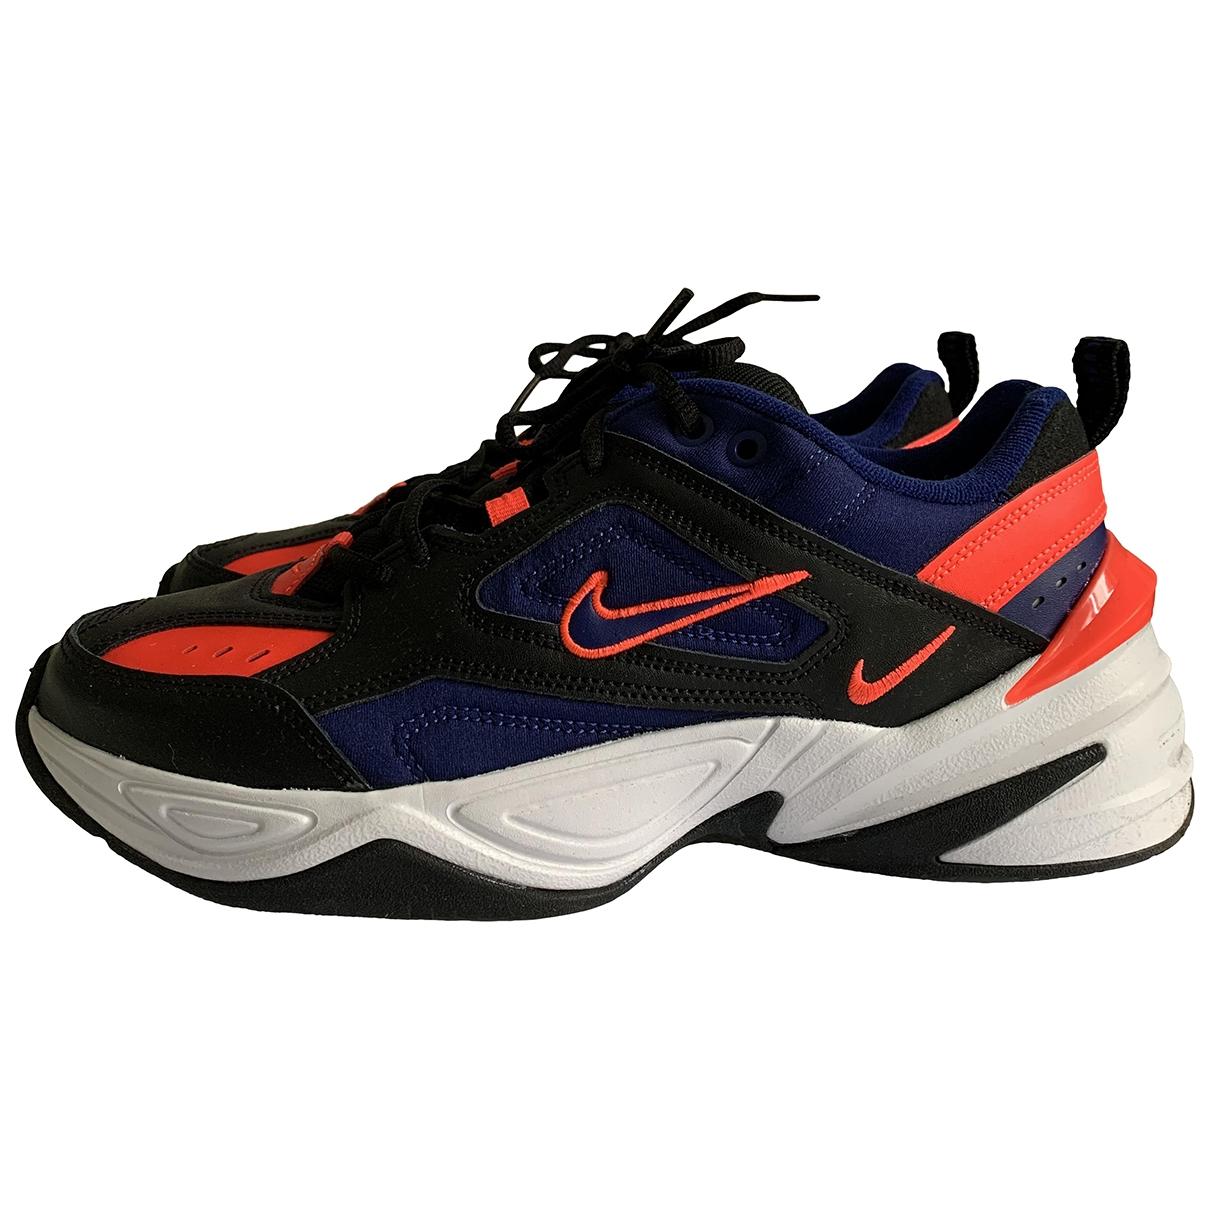 Nike M2K Tekno Blue Leather Trainers for Men 42.5 EU